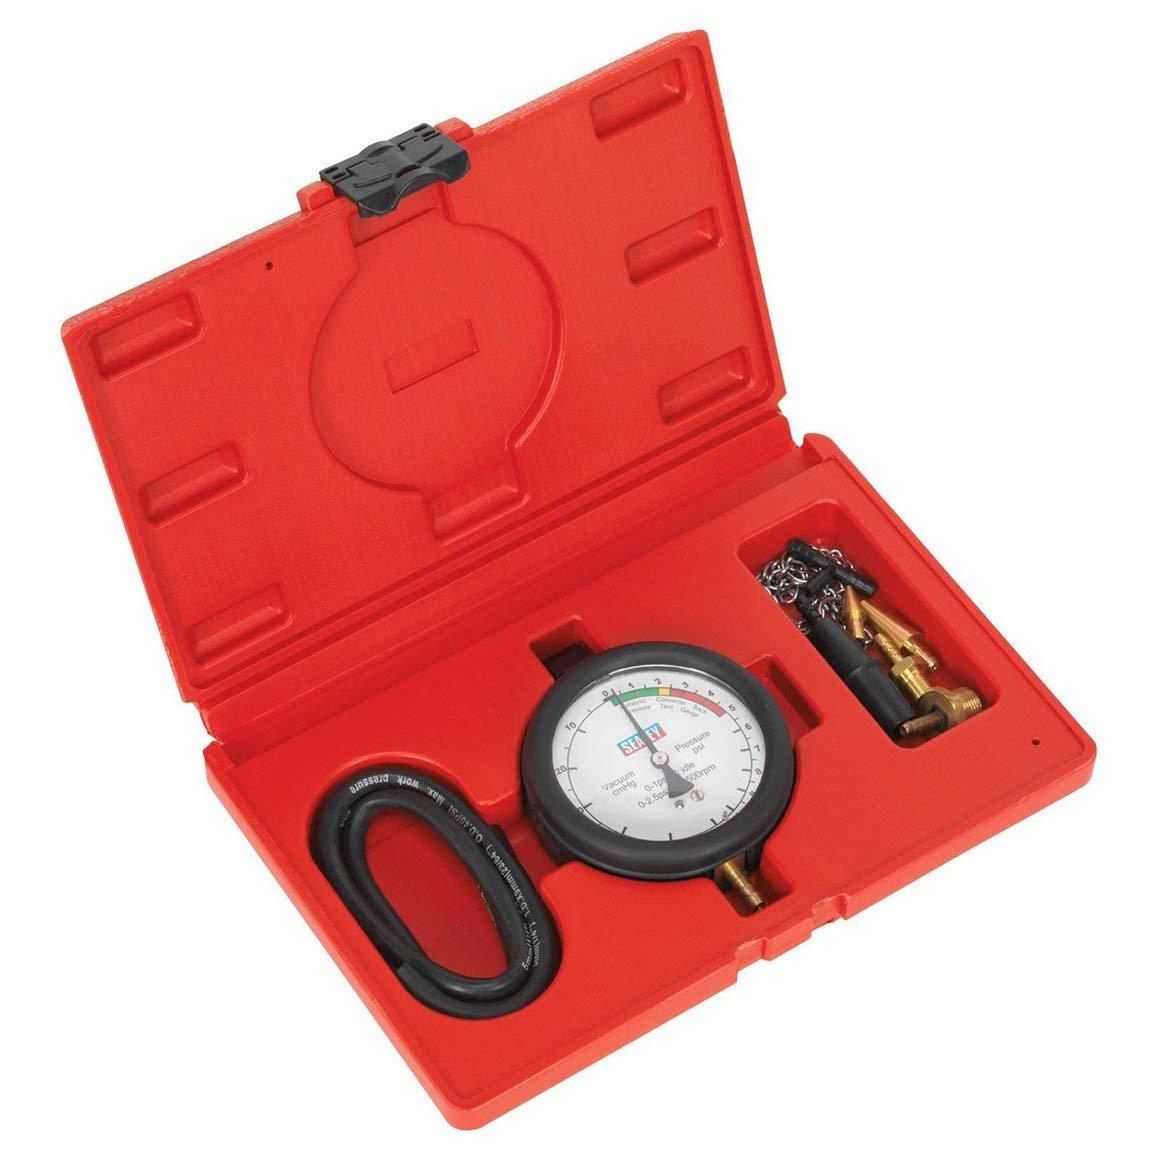 Funnyrunstore Sealey Catalytic Converter/Exhaust Silencer Back Pressure Gauge Test Kit -VSE953